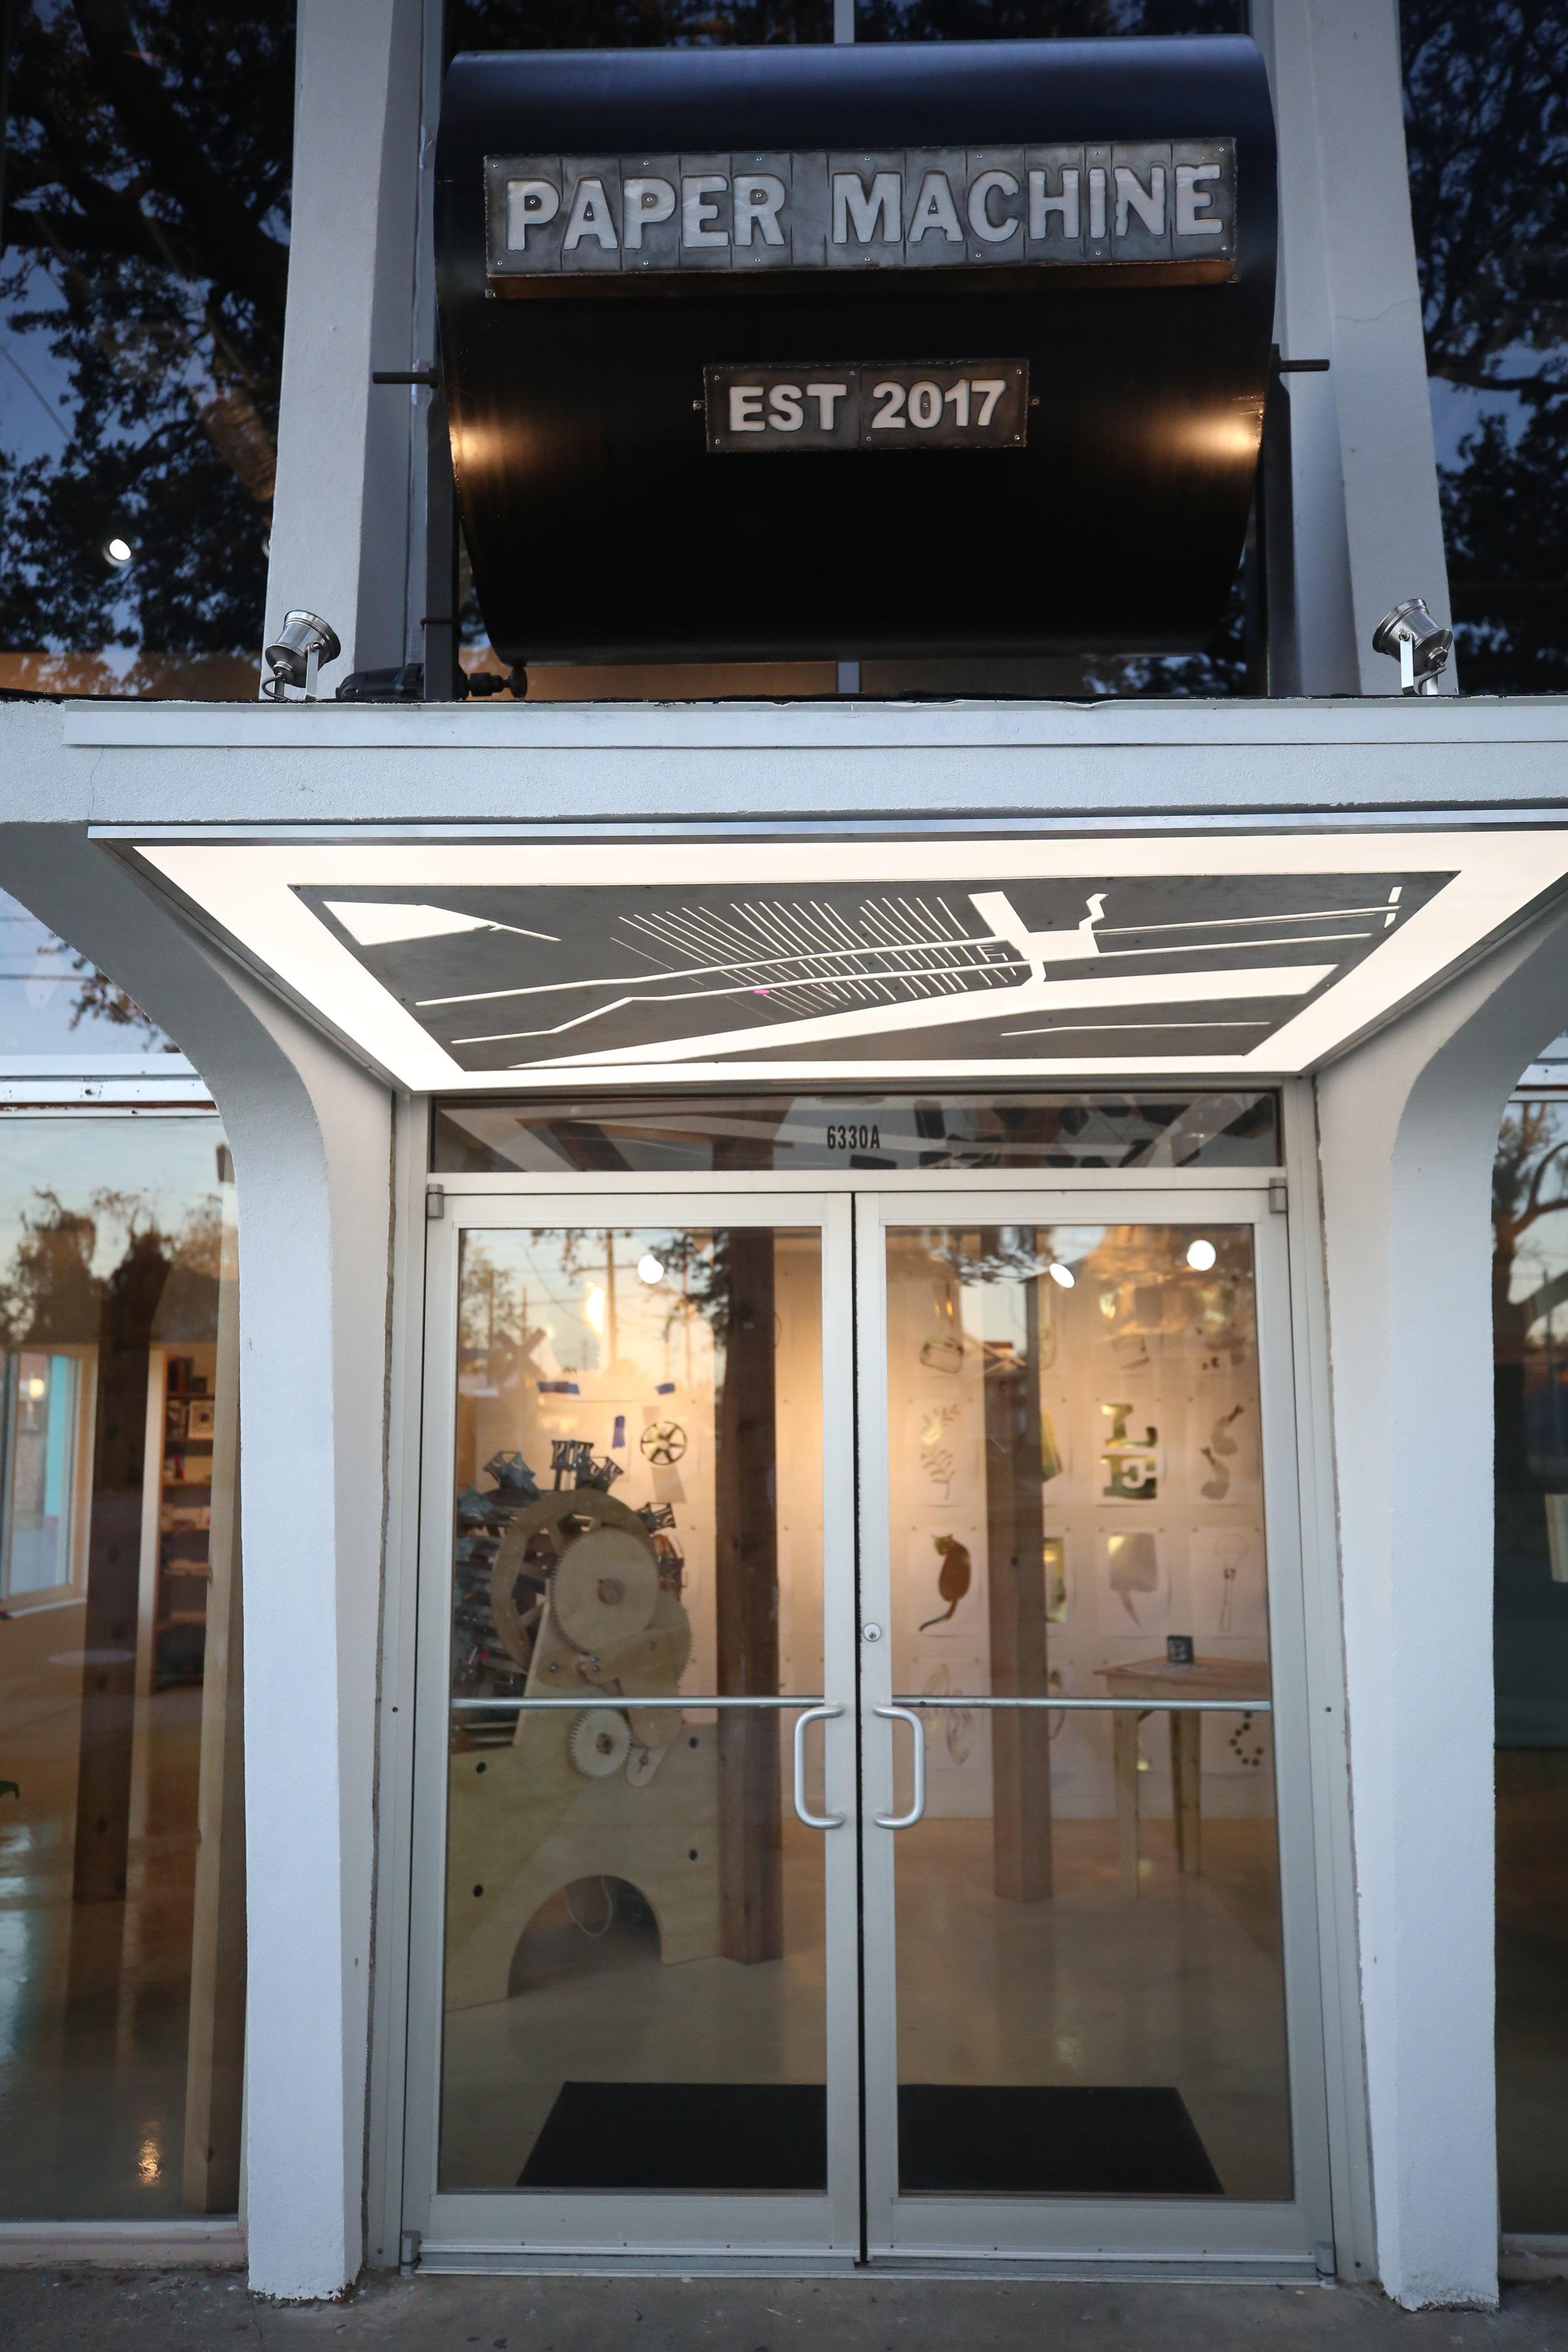 11-28-2017 Opening of Paper Machine 026.jpeg